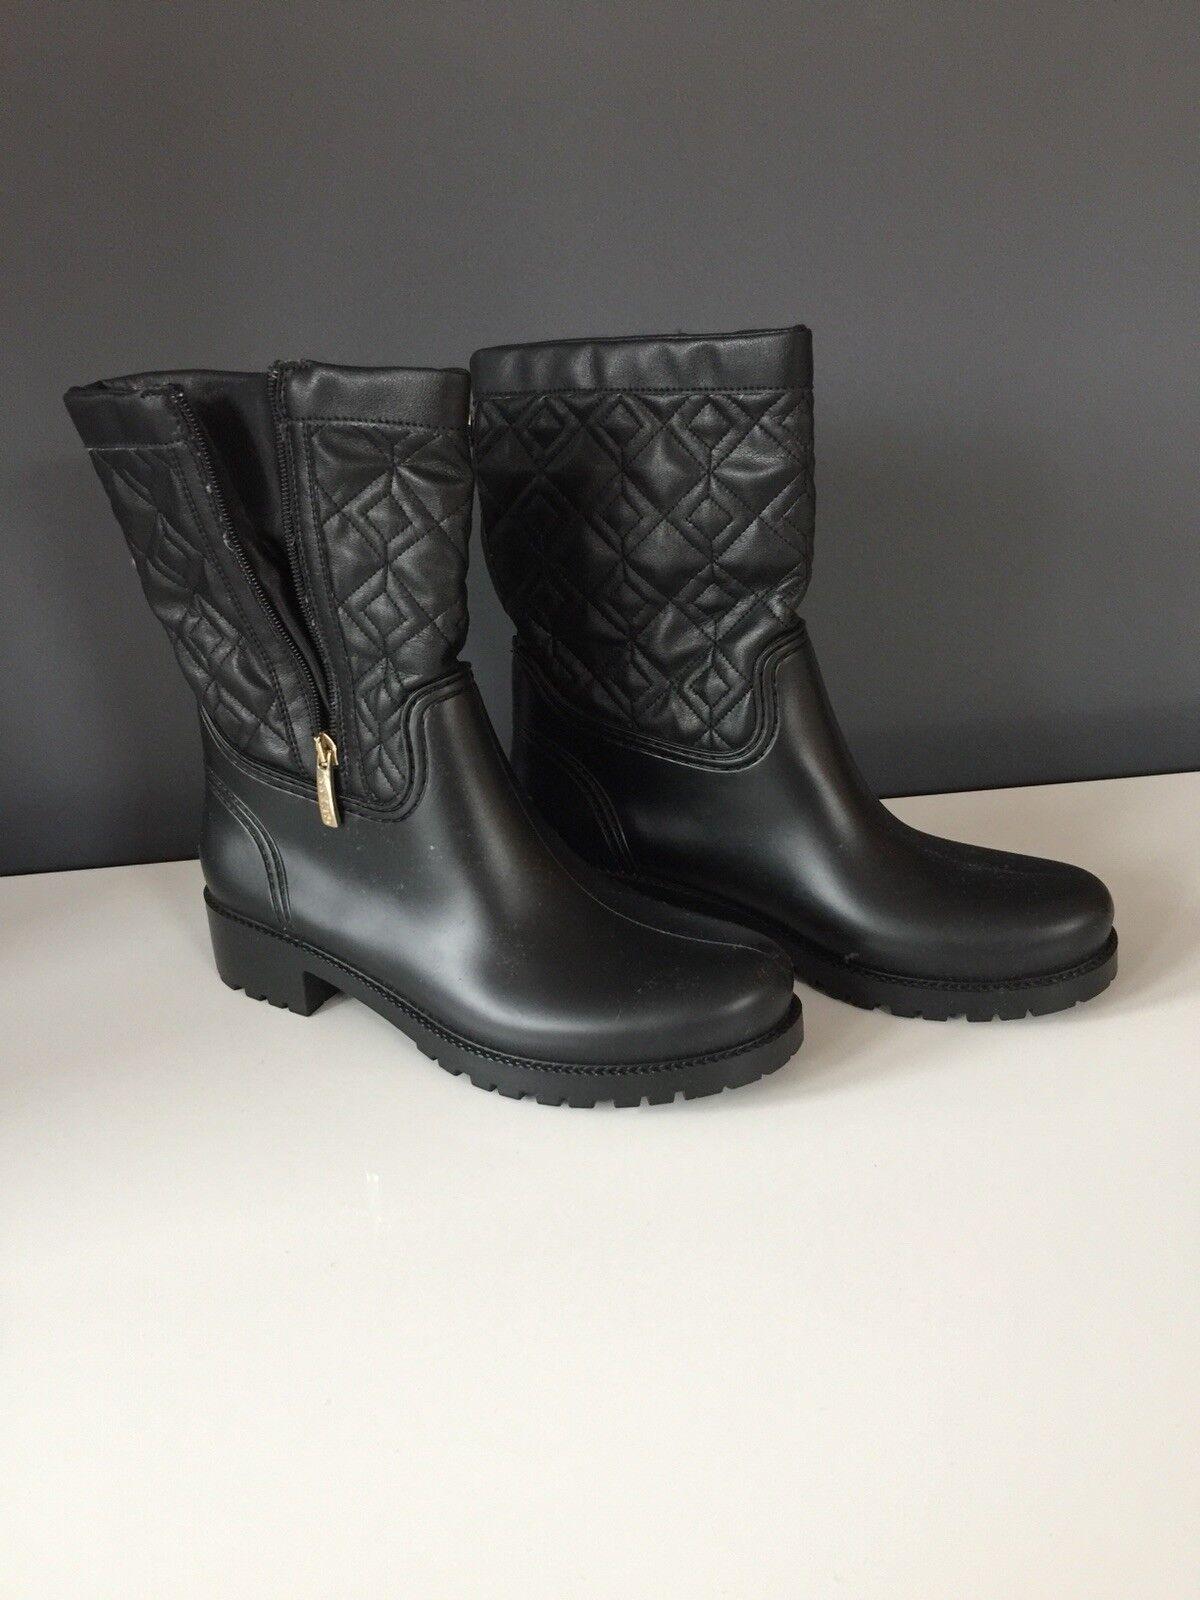 Guess Rubber Boots Size Eur 40